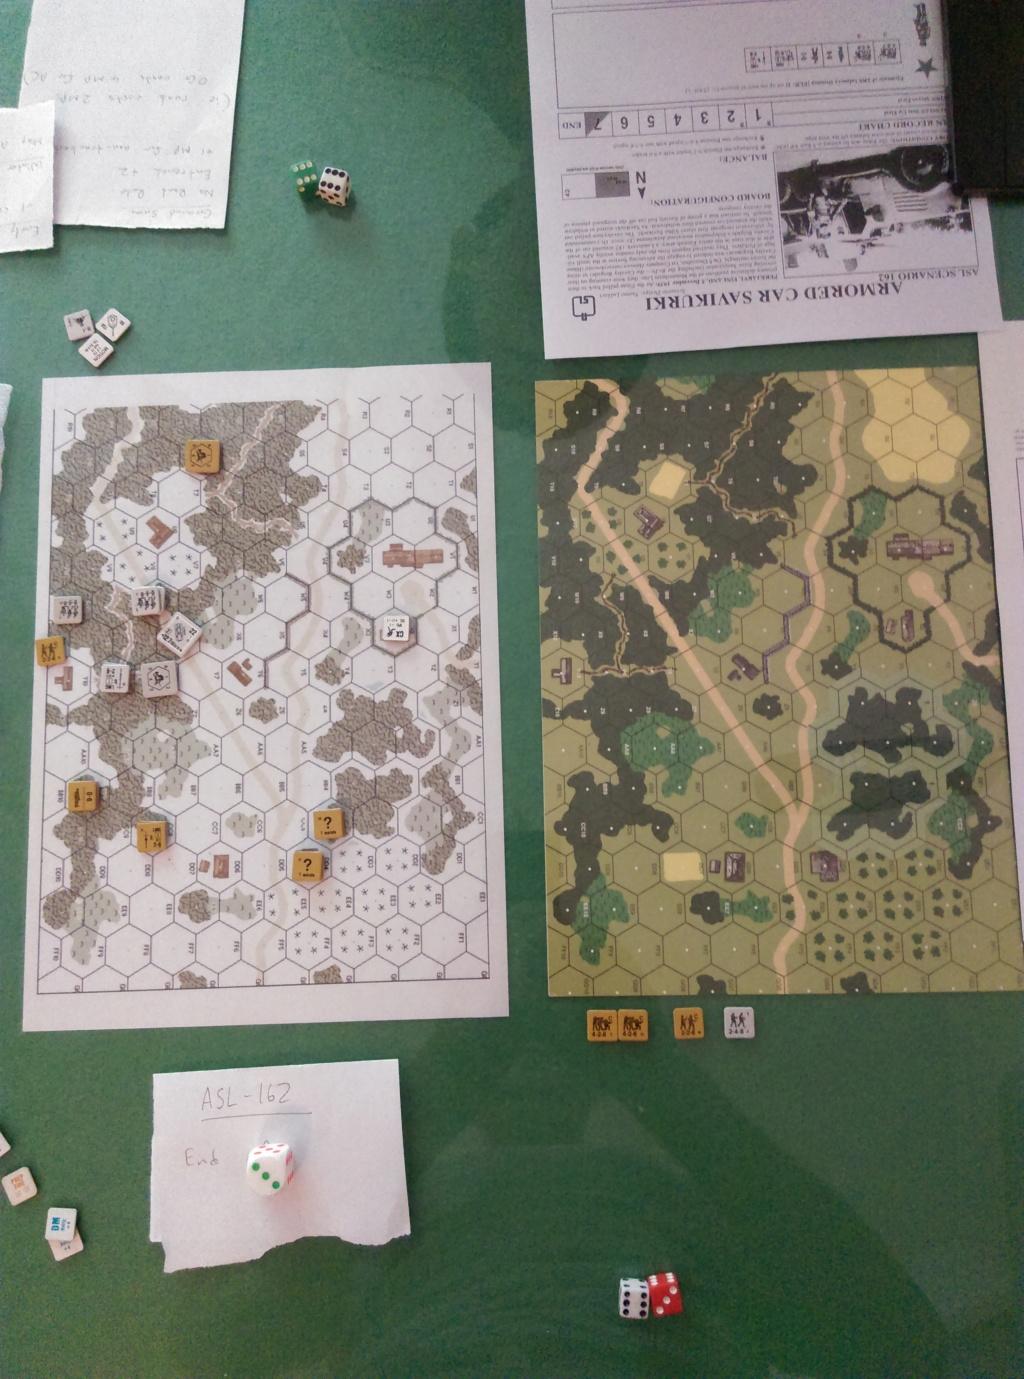 AFV training in Wugu. (John vs Roy) Asl-1612